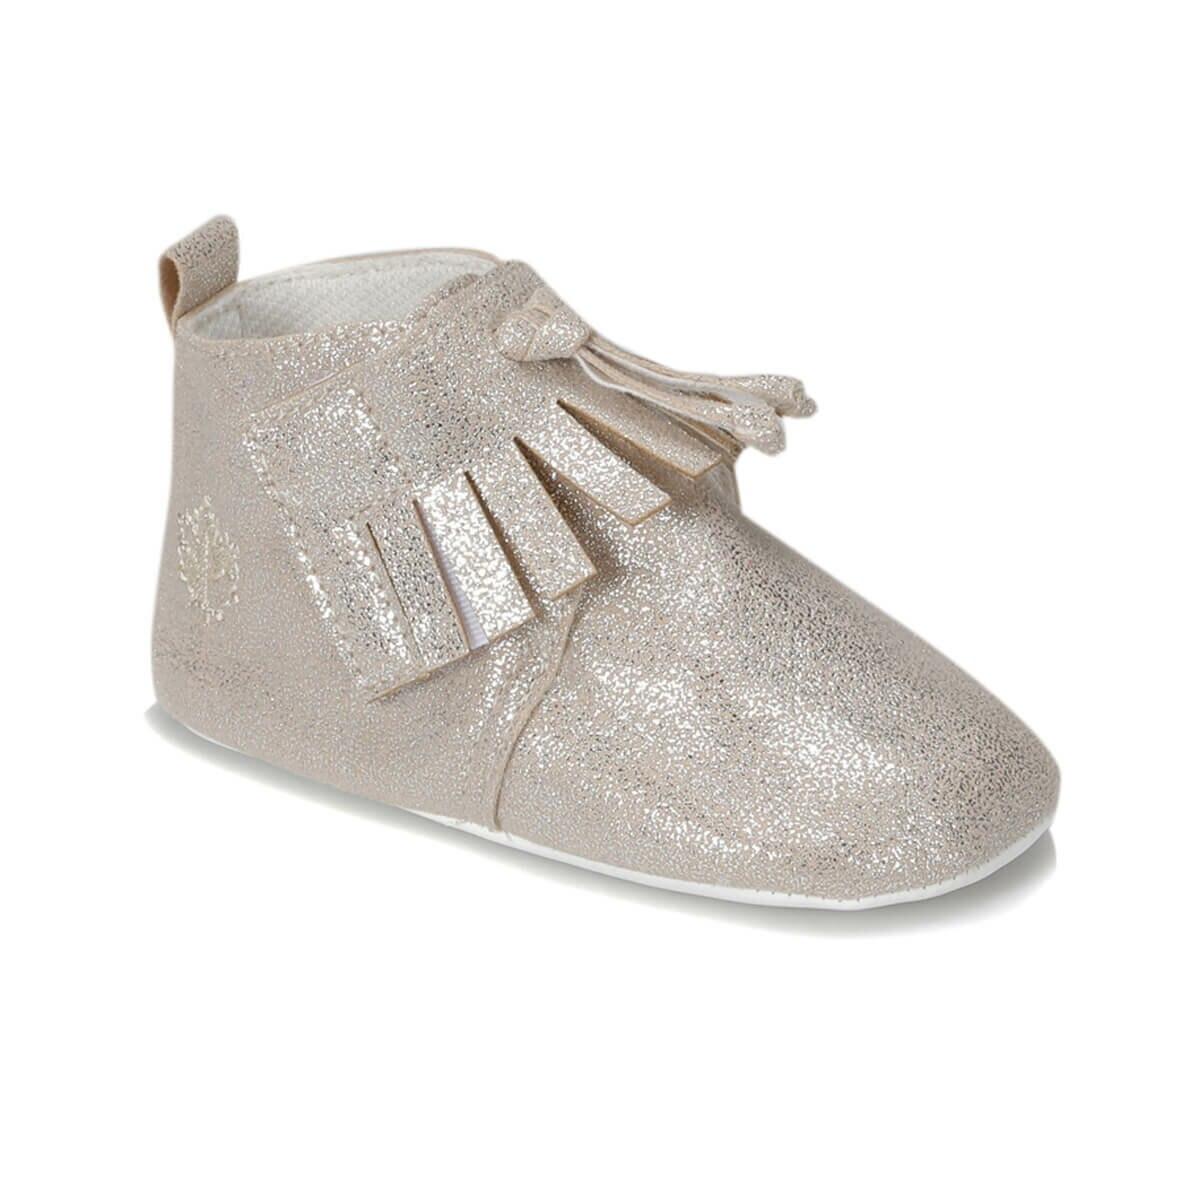 FLO CHOKO 9PR Golden Girl Kids Casual Shoes LUMBERJACK